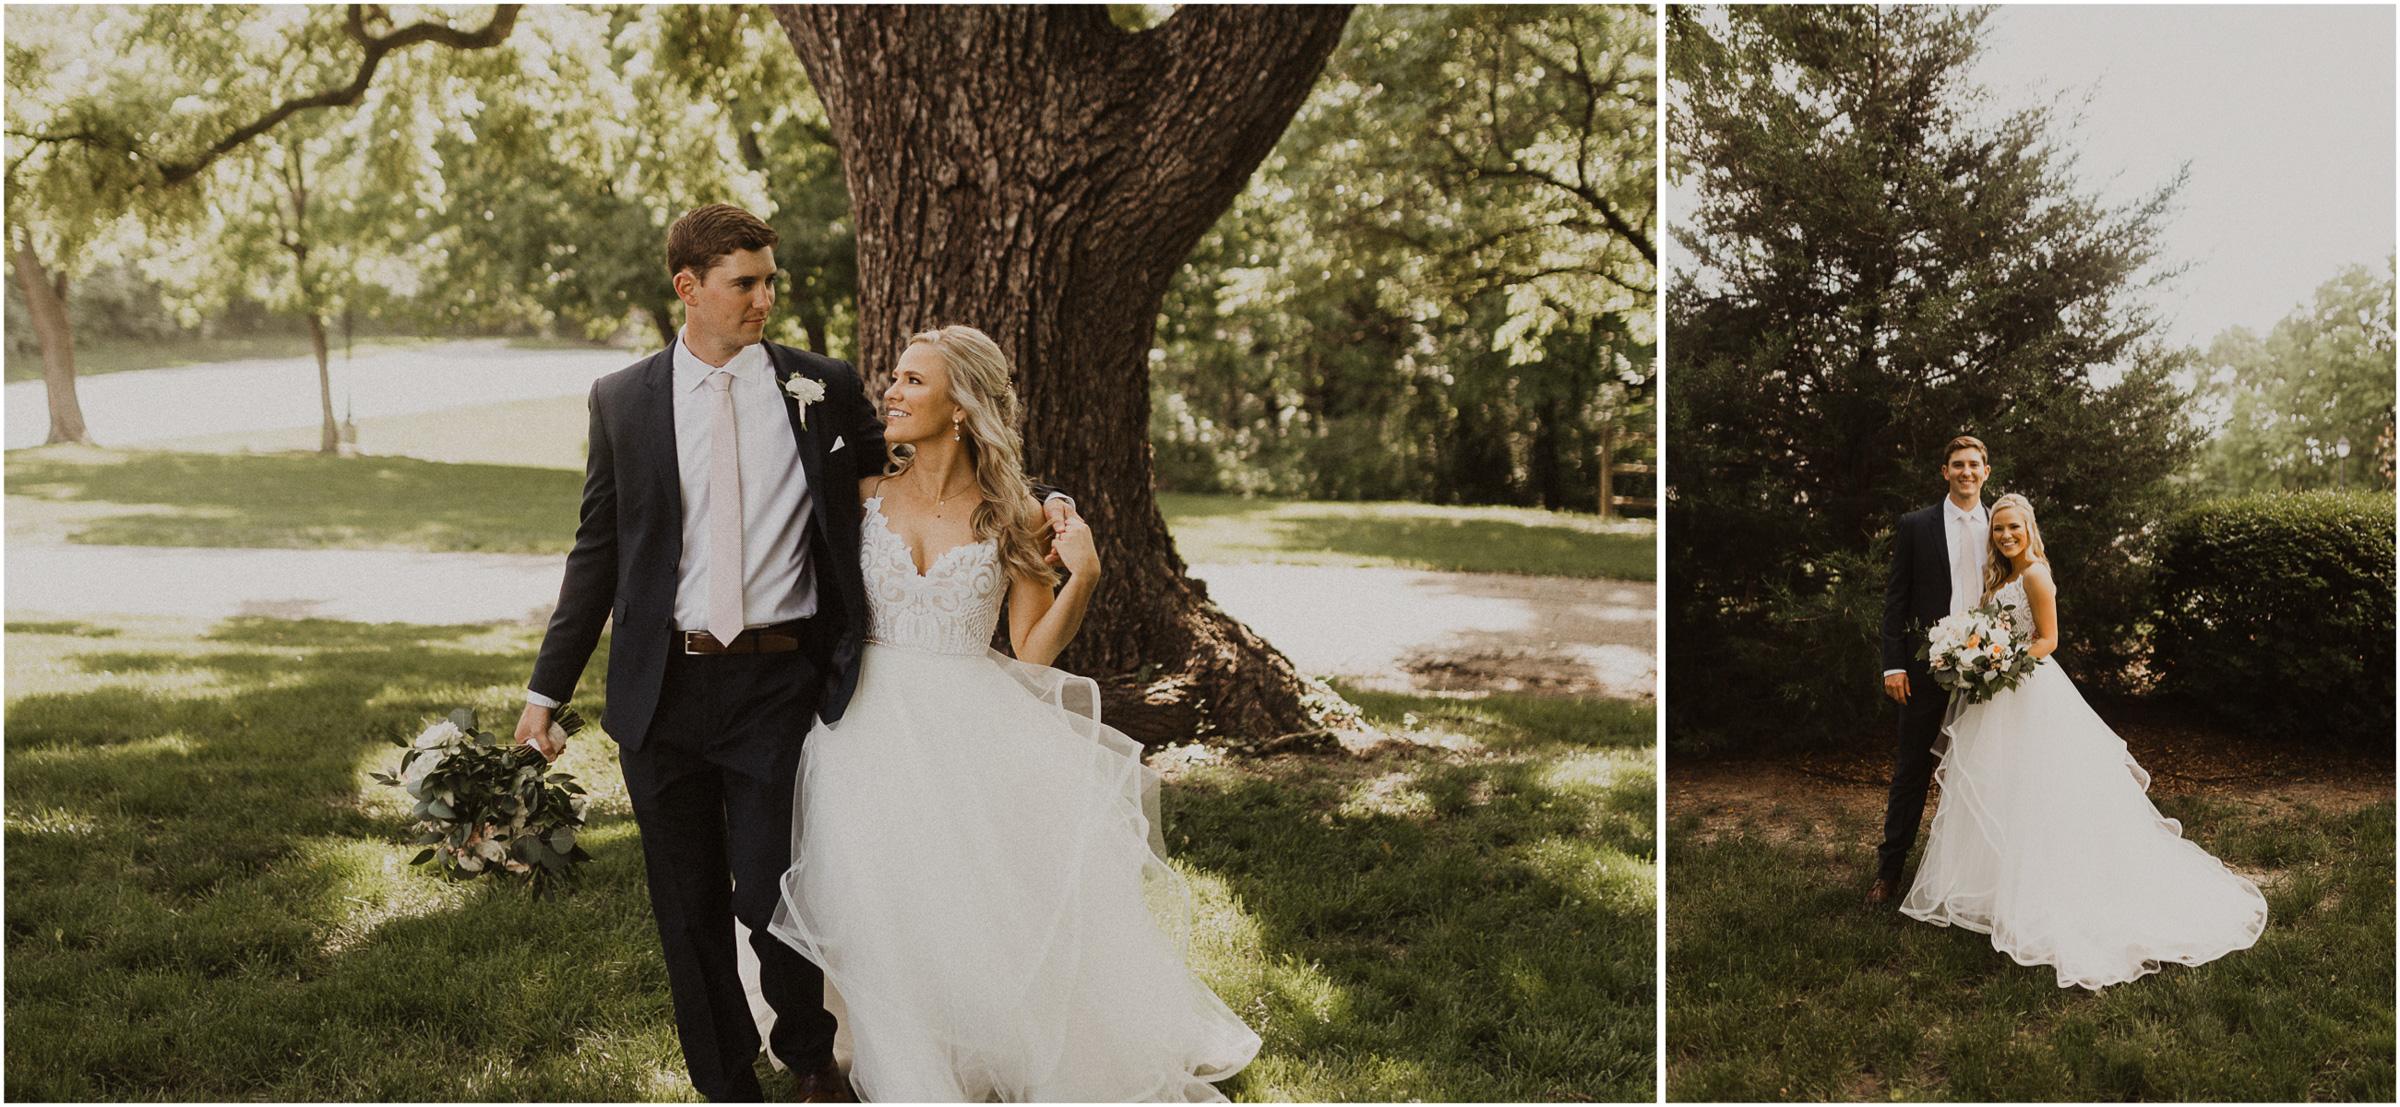 alyssa barletter photography hawthorne house summer outdoor wedding southern charm inspiration-35.jpg